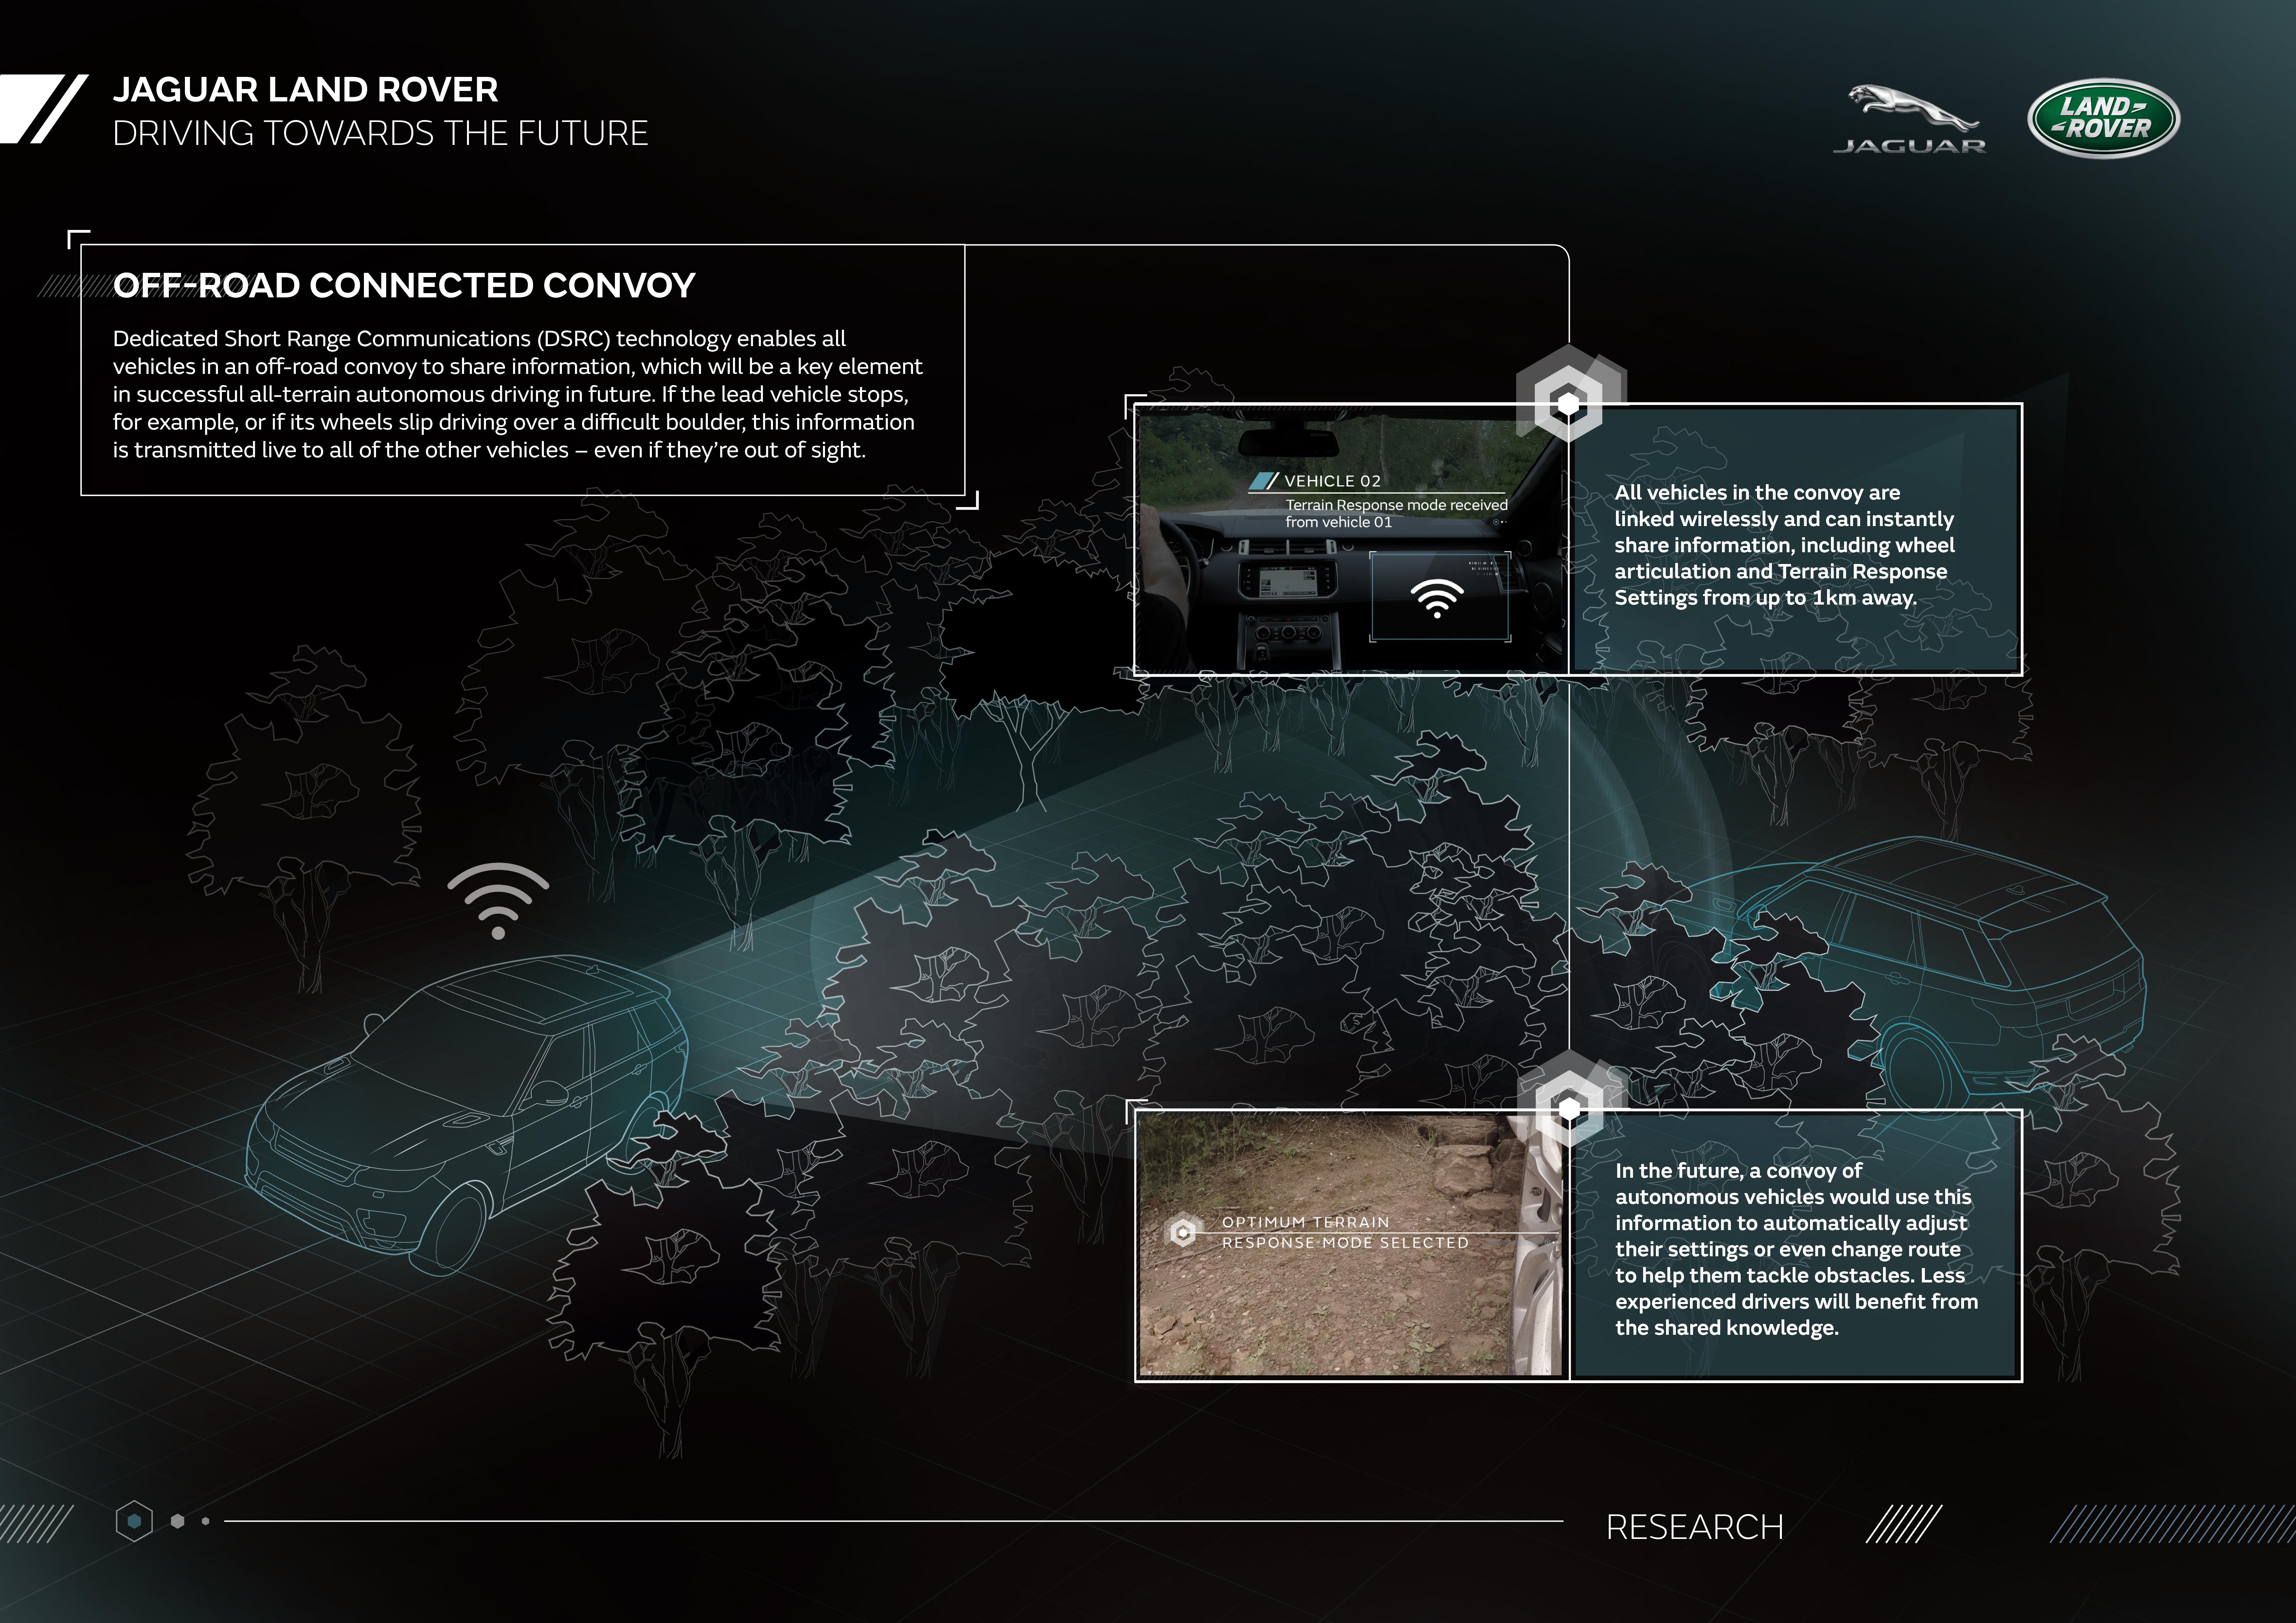 jlrdemonstratesallterrainselfdrivingechnologytechsinfographicsoffroadconnectedconvoy